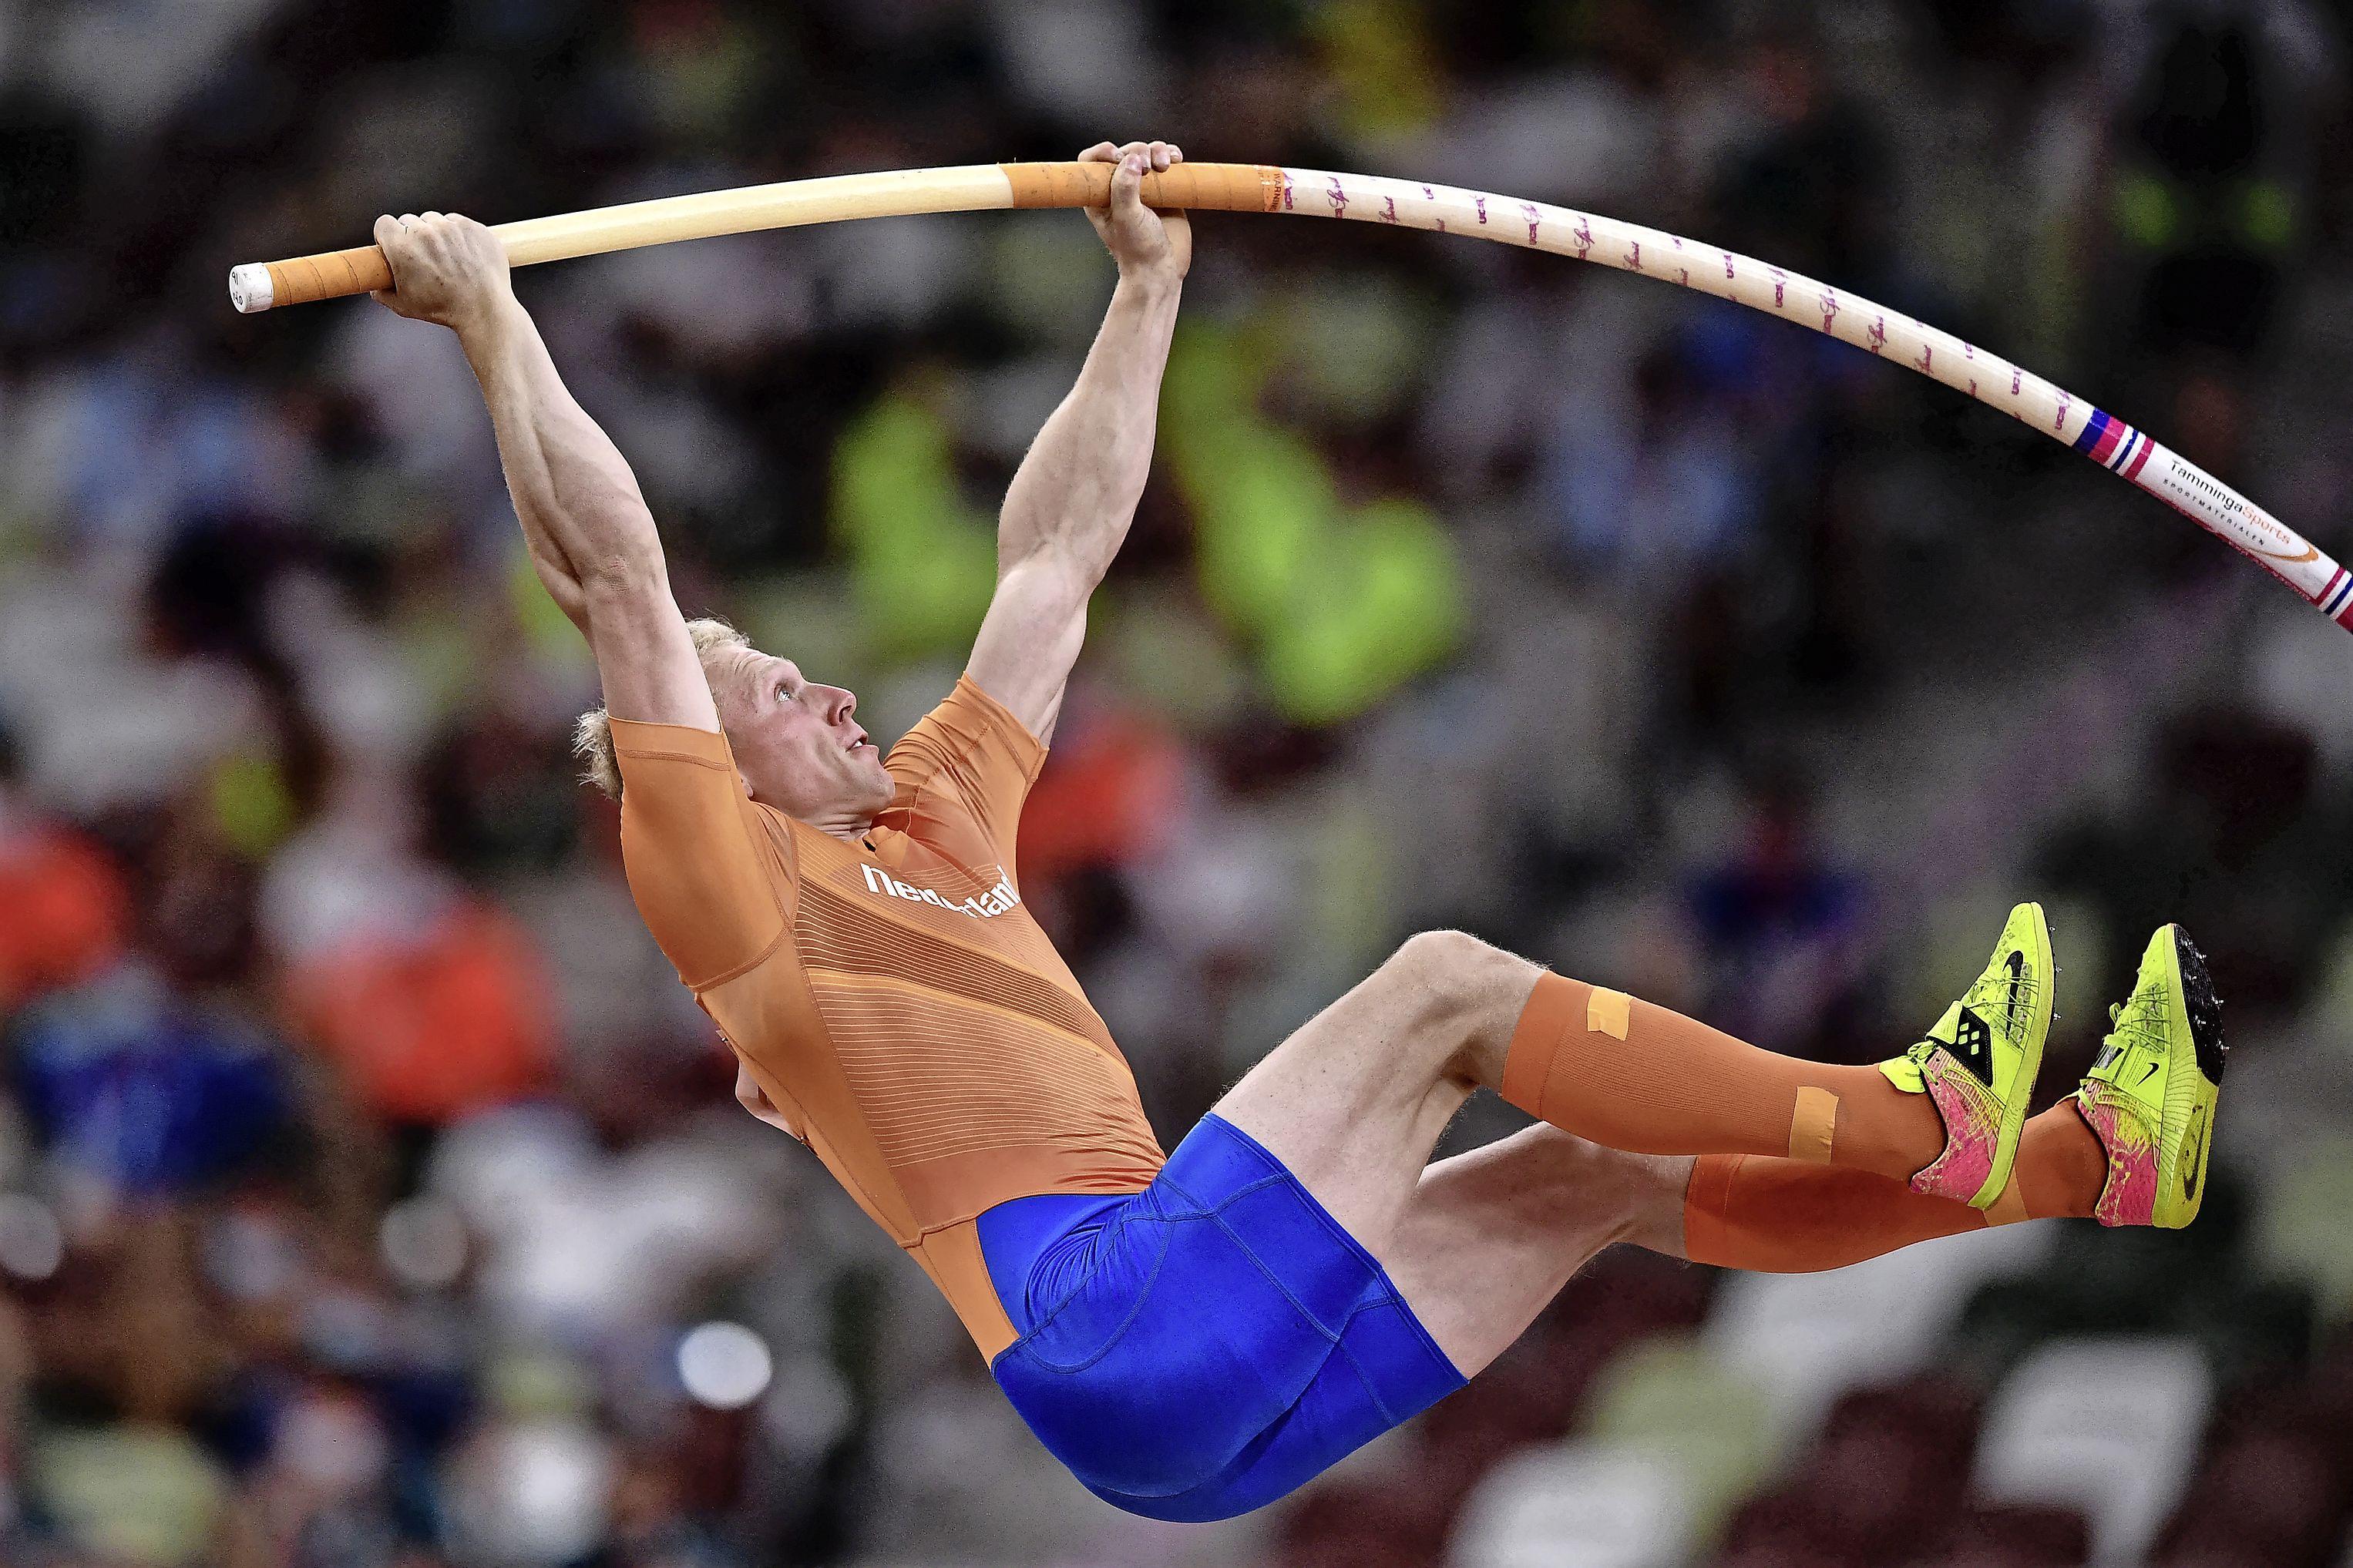 Menno Vloon uit Krommenie al snel klaar in olympische finale polsstokhoogspringen